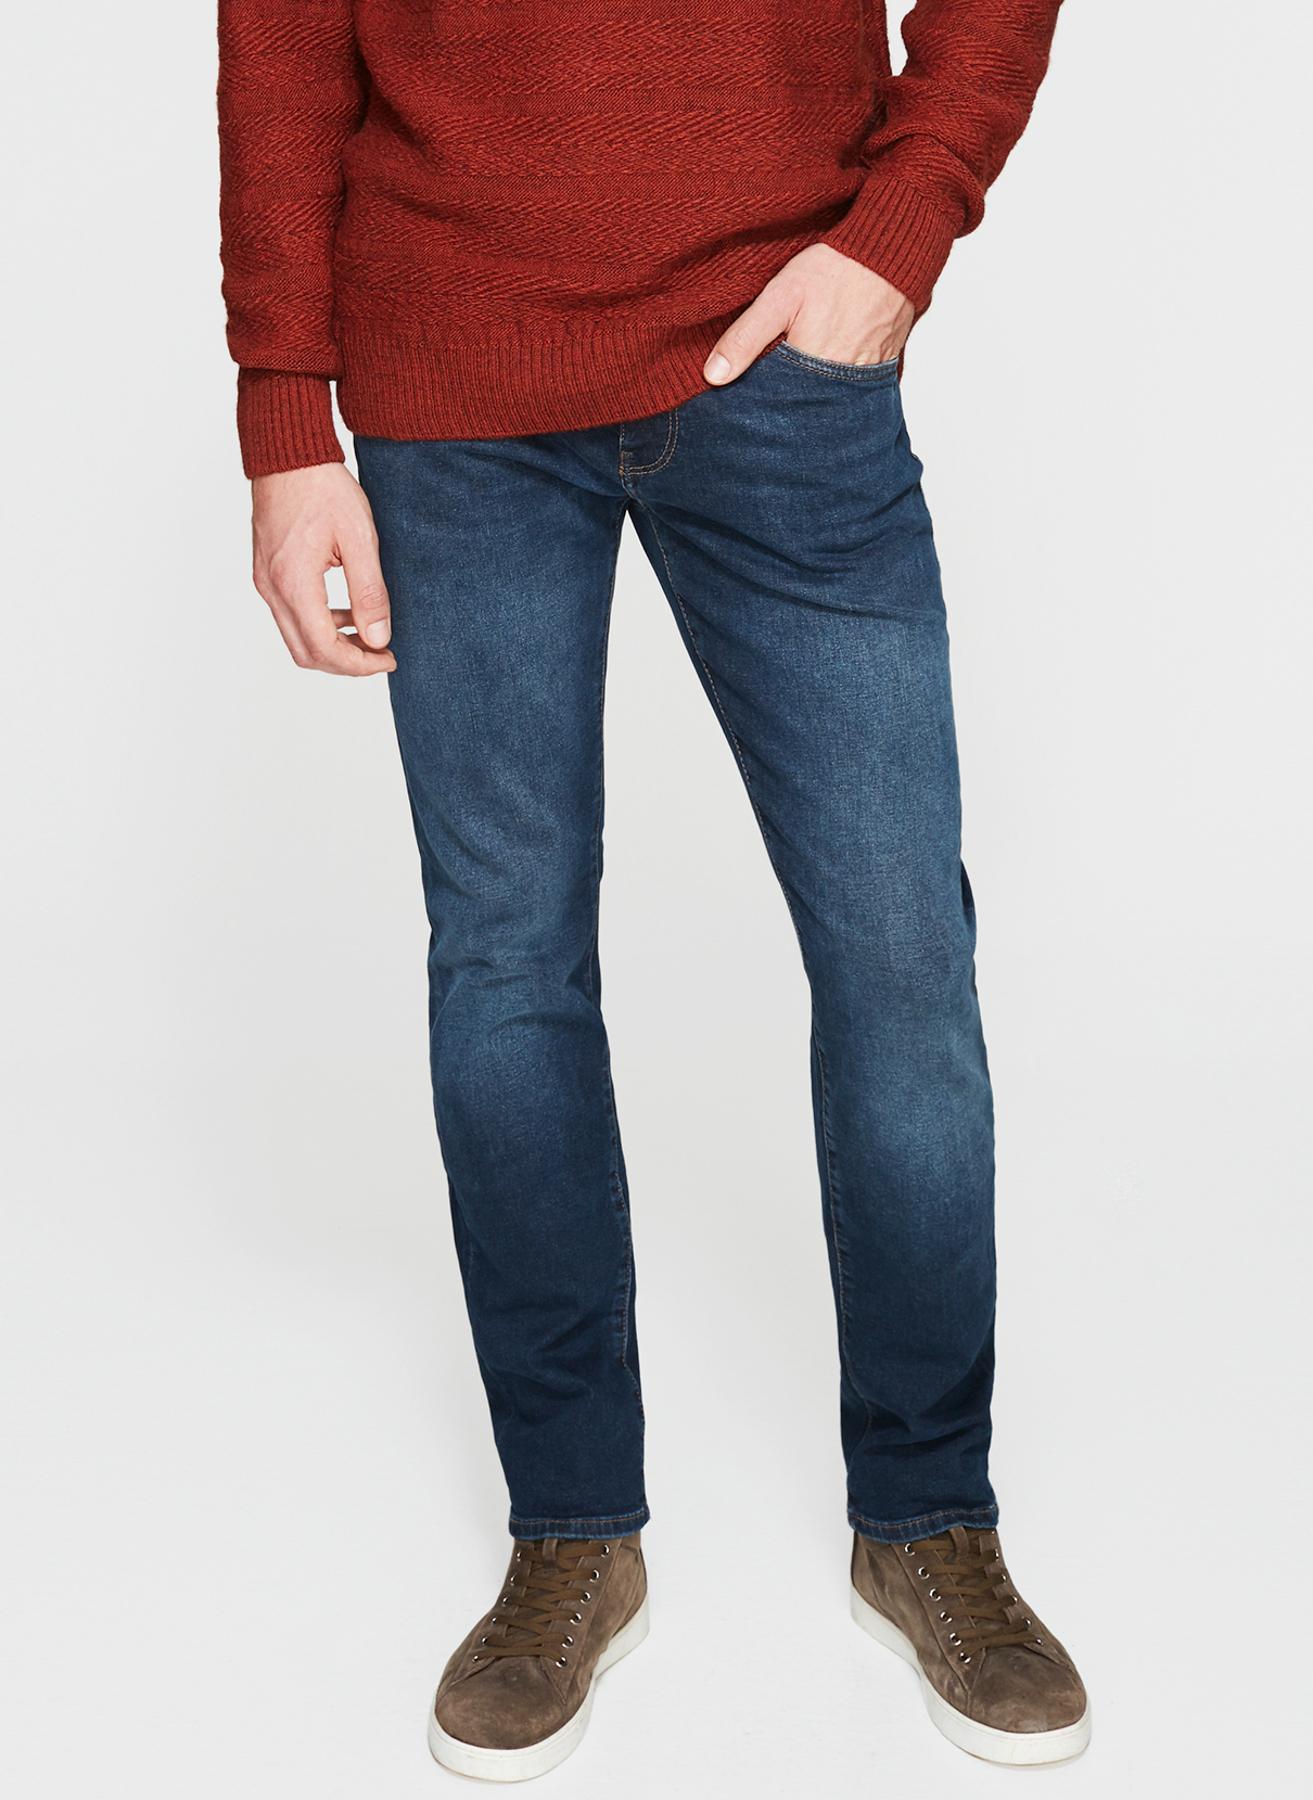 Mavi Klasik Pantolon 31-30 5001634316015 Ürün Resmi